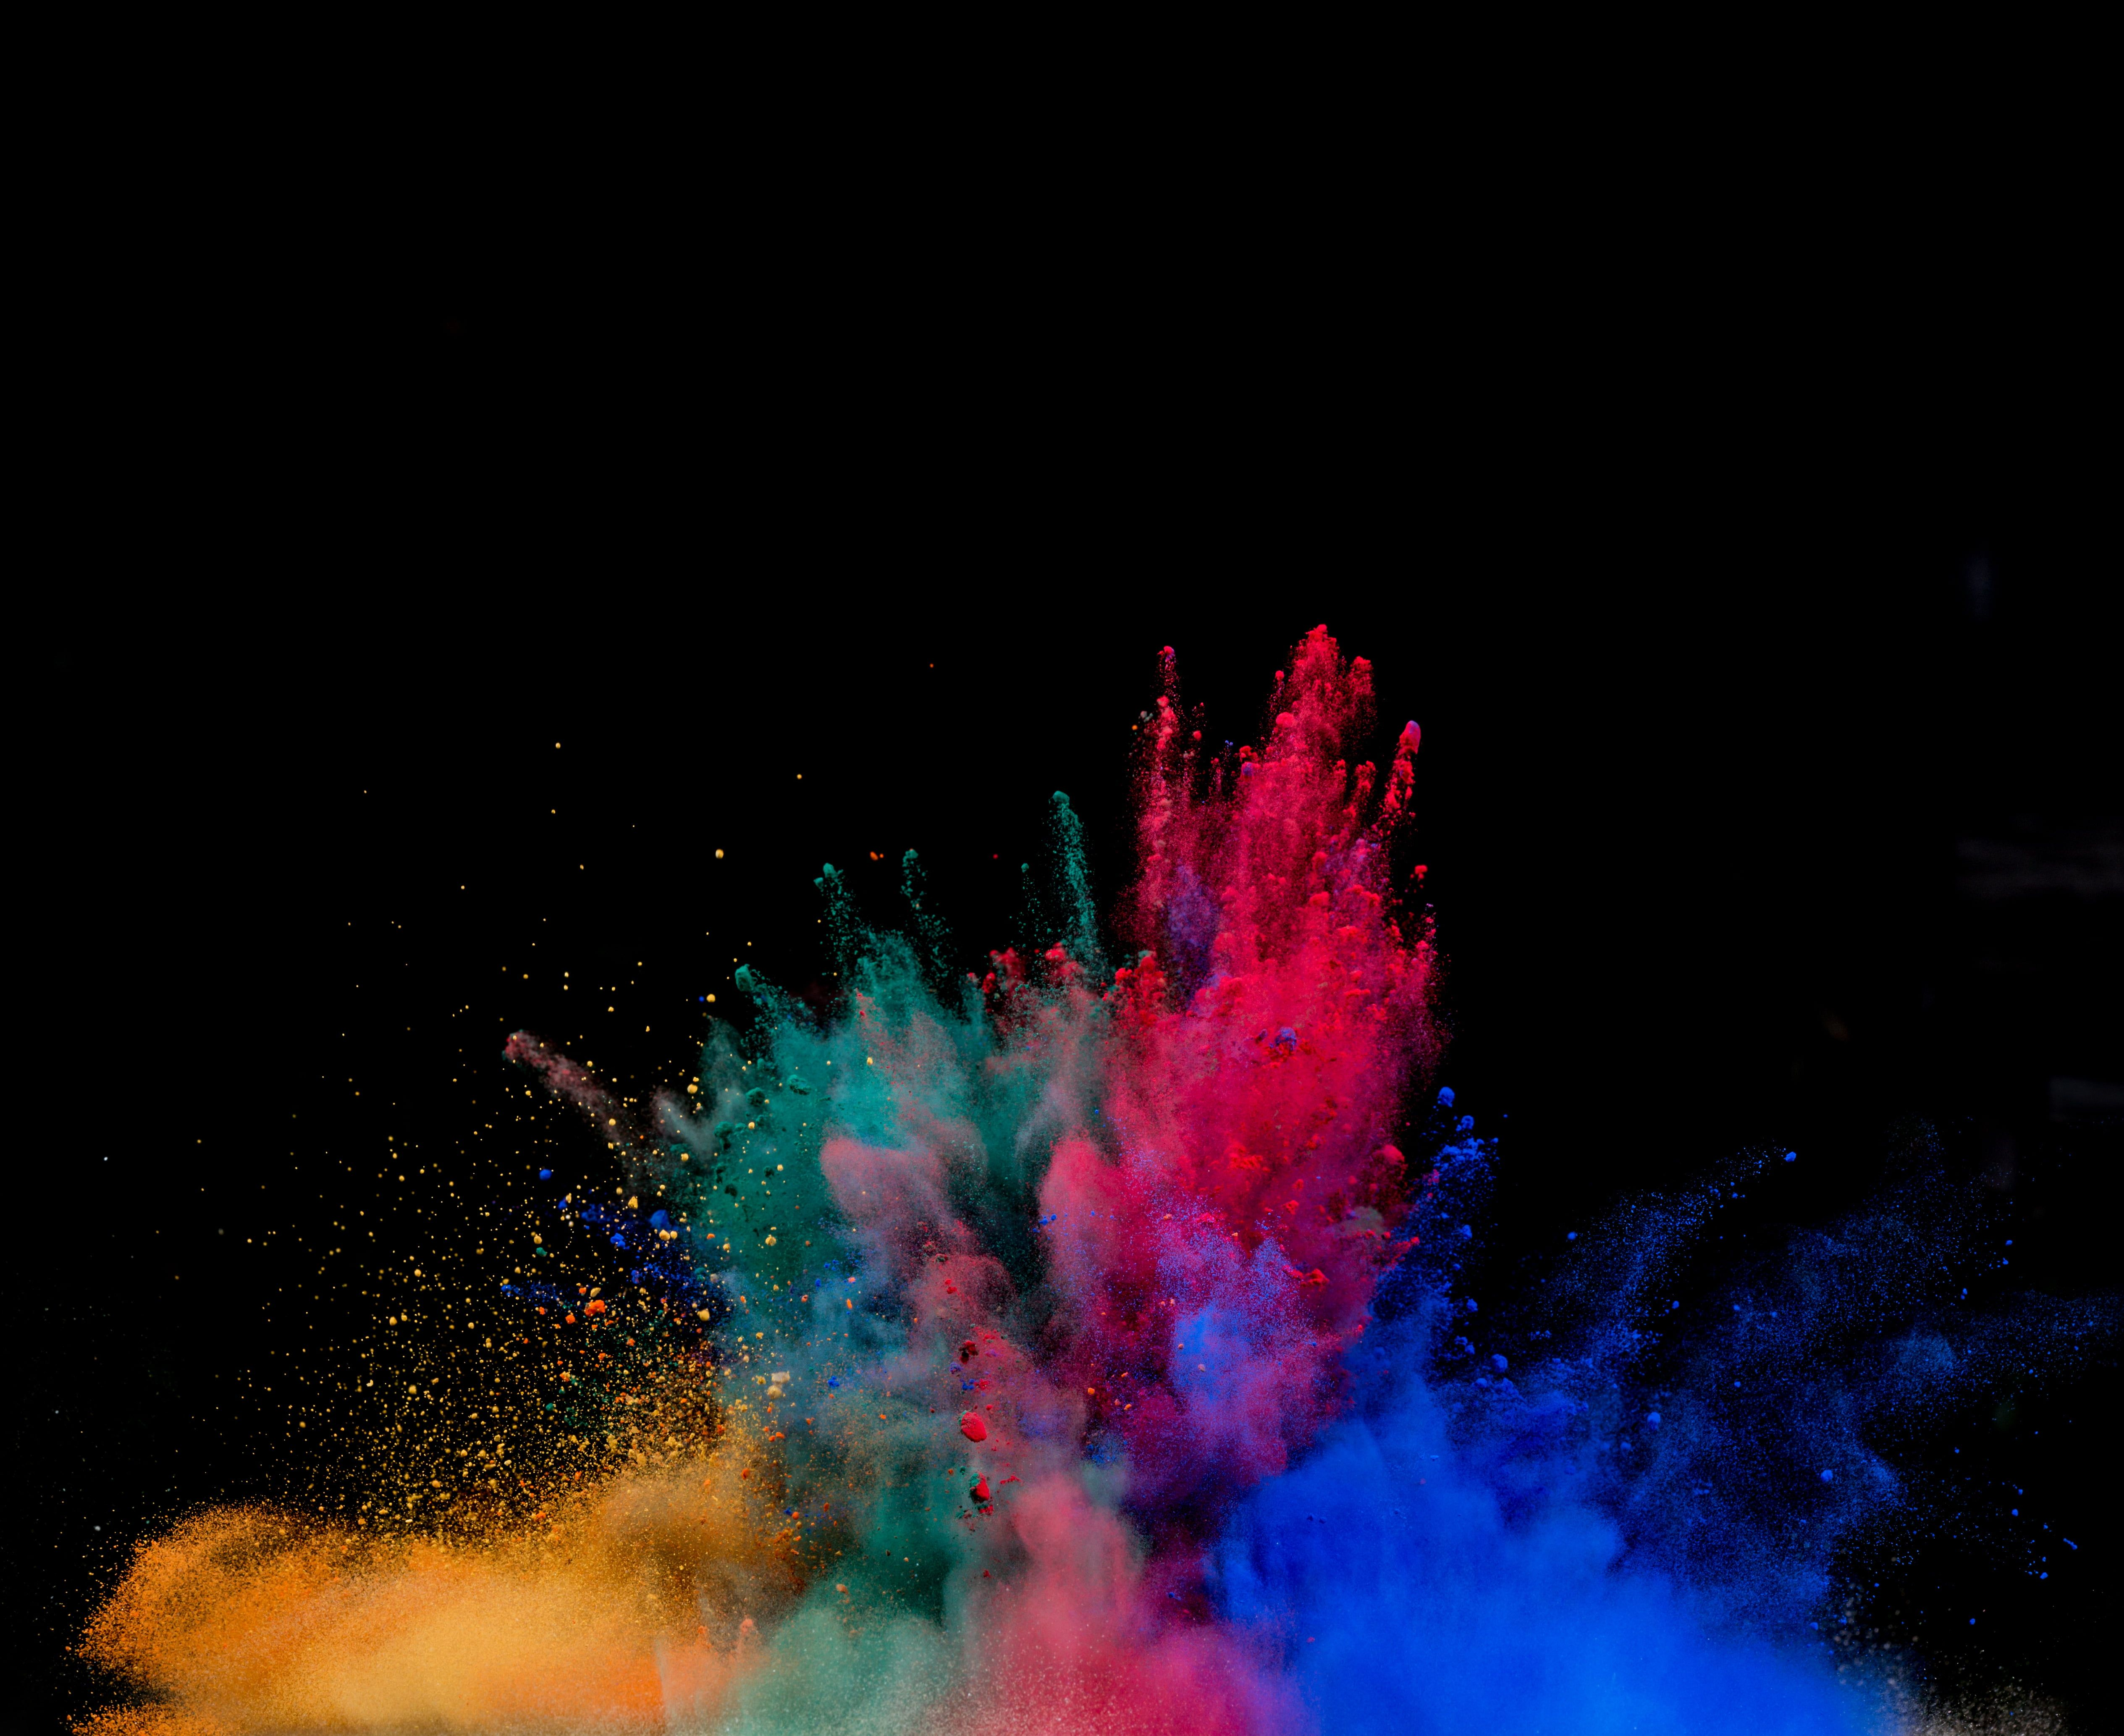 Multicolored Holi Powders Powder Explosion Powder Colorful 4k Wallpaper Hdwallpaper Desktop Motion Wallpapers Art Wallpaper Colorful Wallpaper